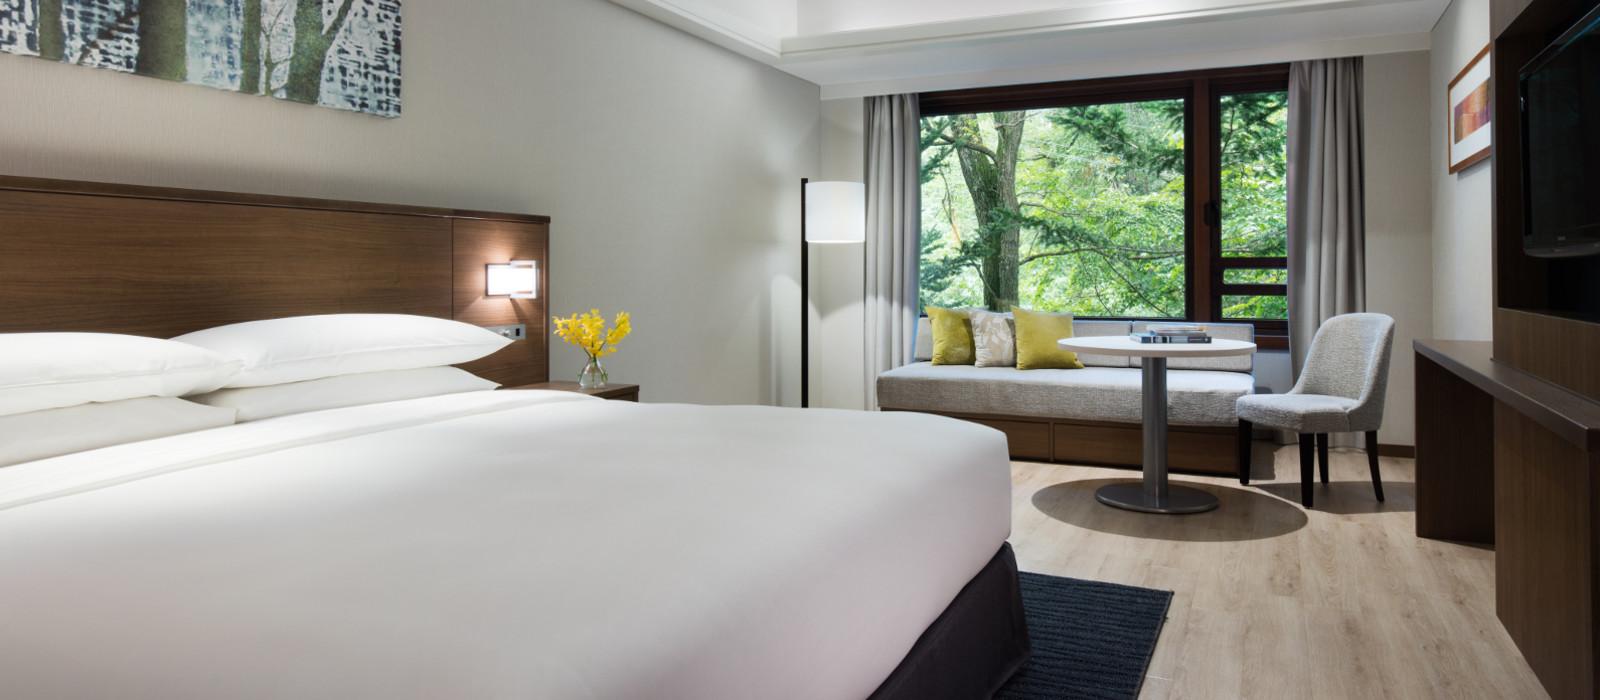 Hotel Karuizawa Marriott  Japan